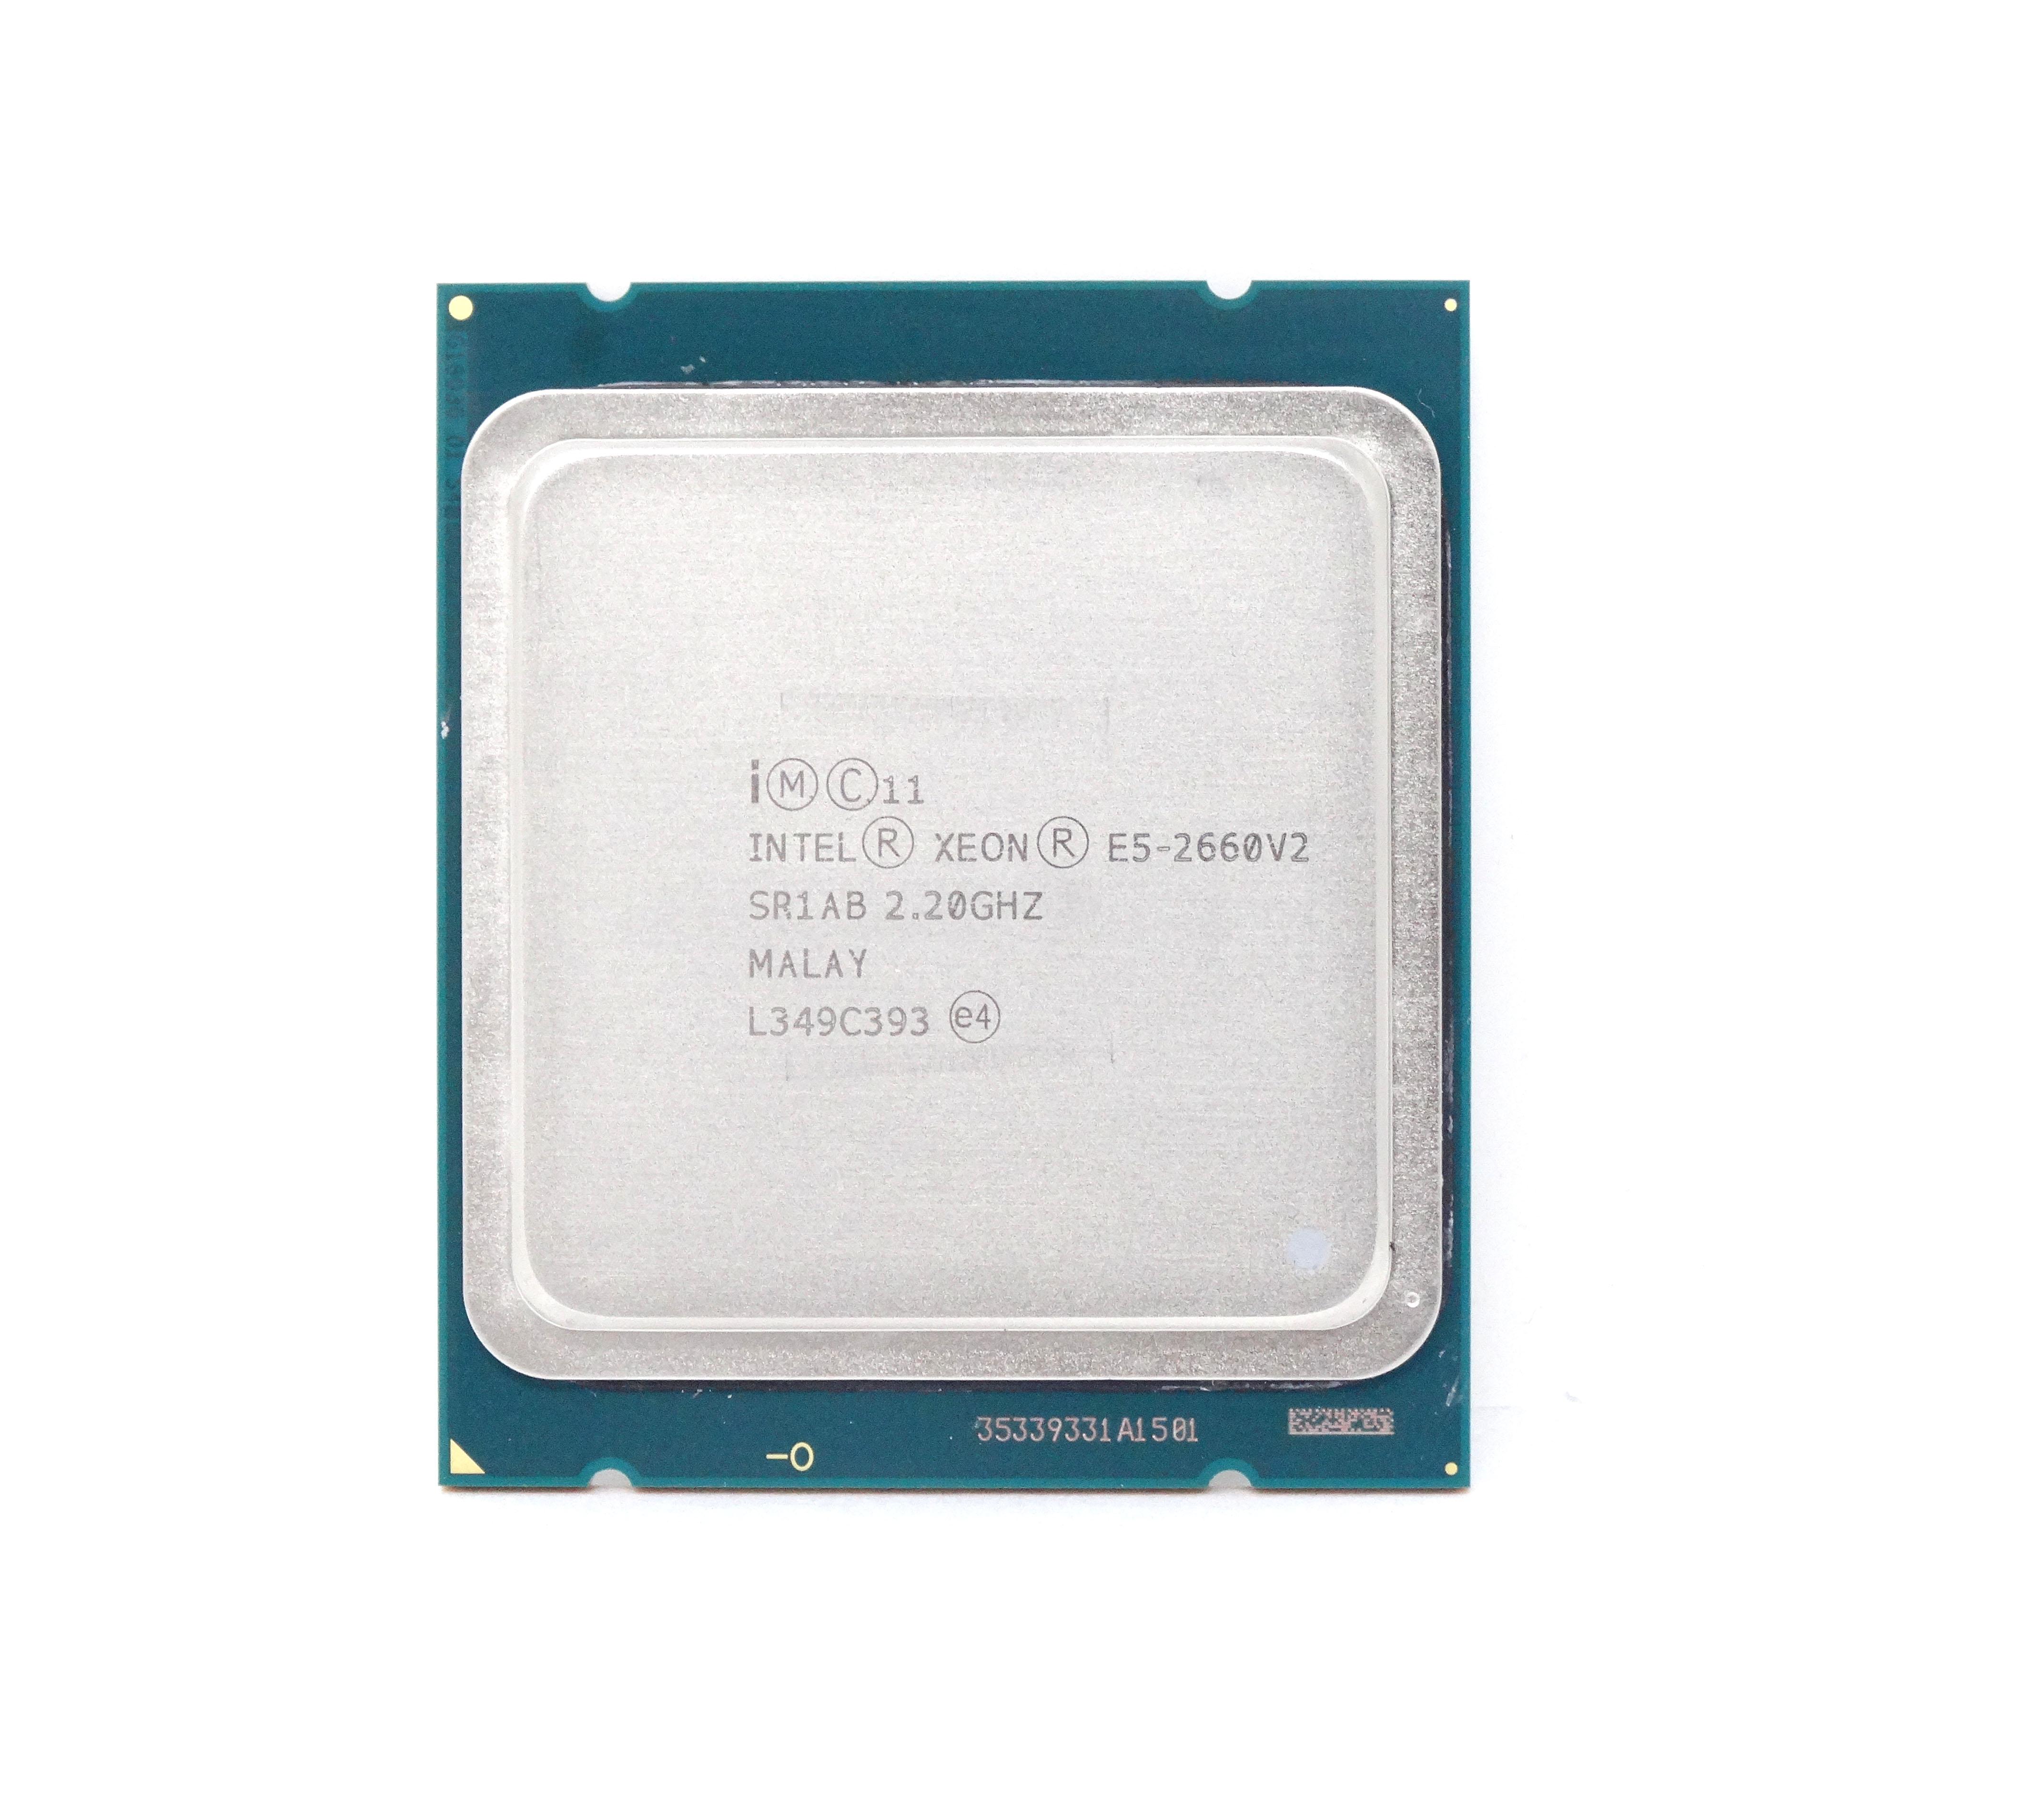 INTEL XEON E5-2660V2  2.2GHZ 10 CORE 25MB 8GT/S  PROCESSOR (SR1AB)